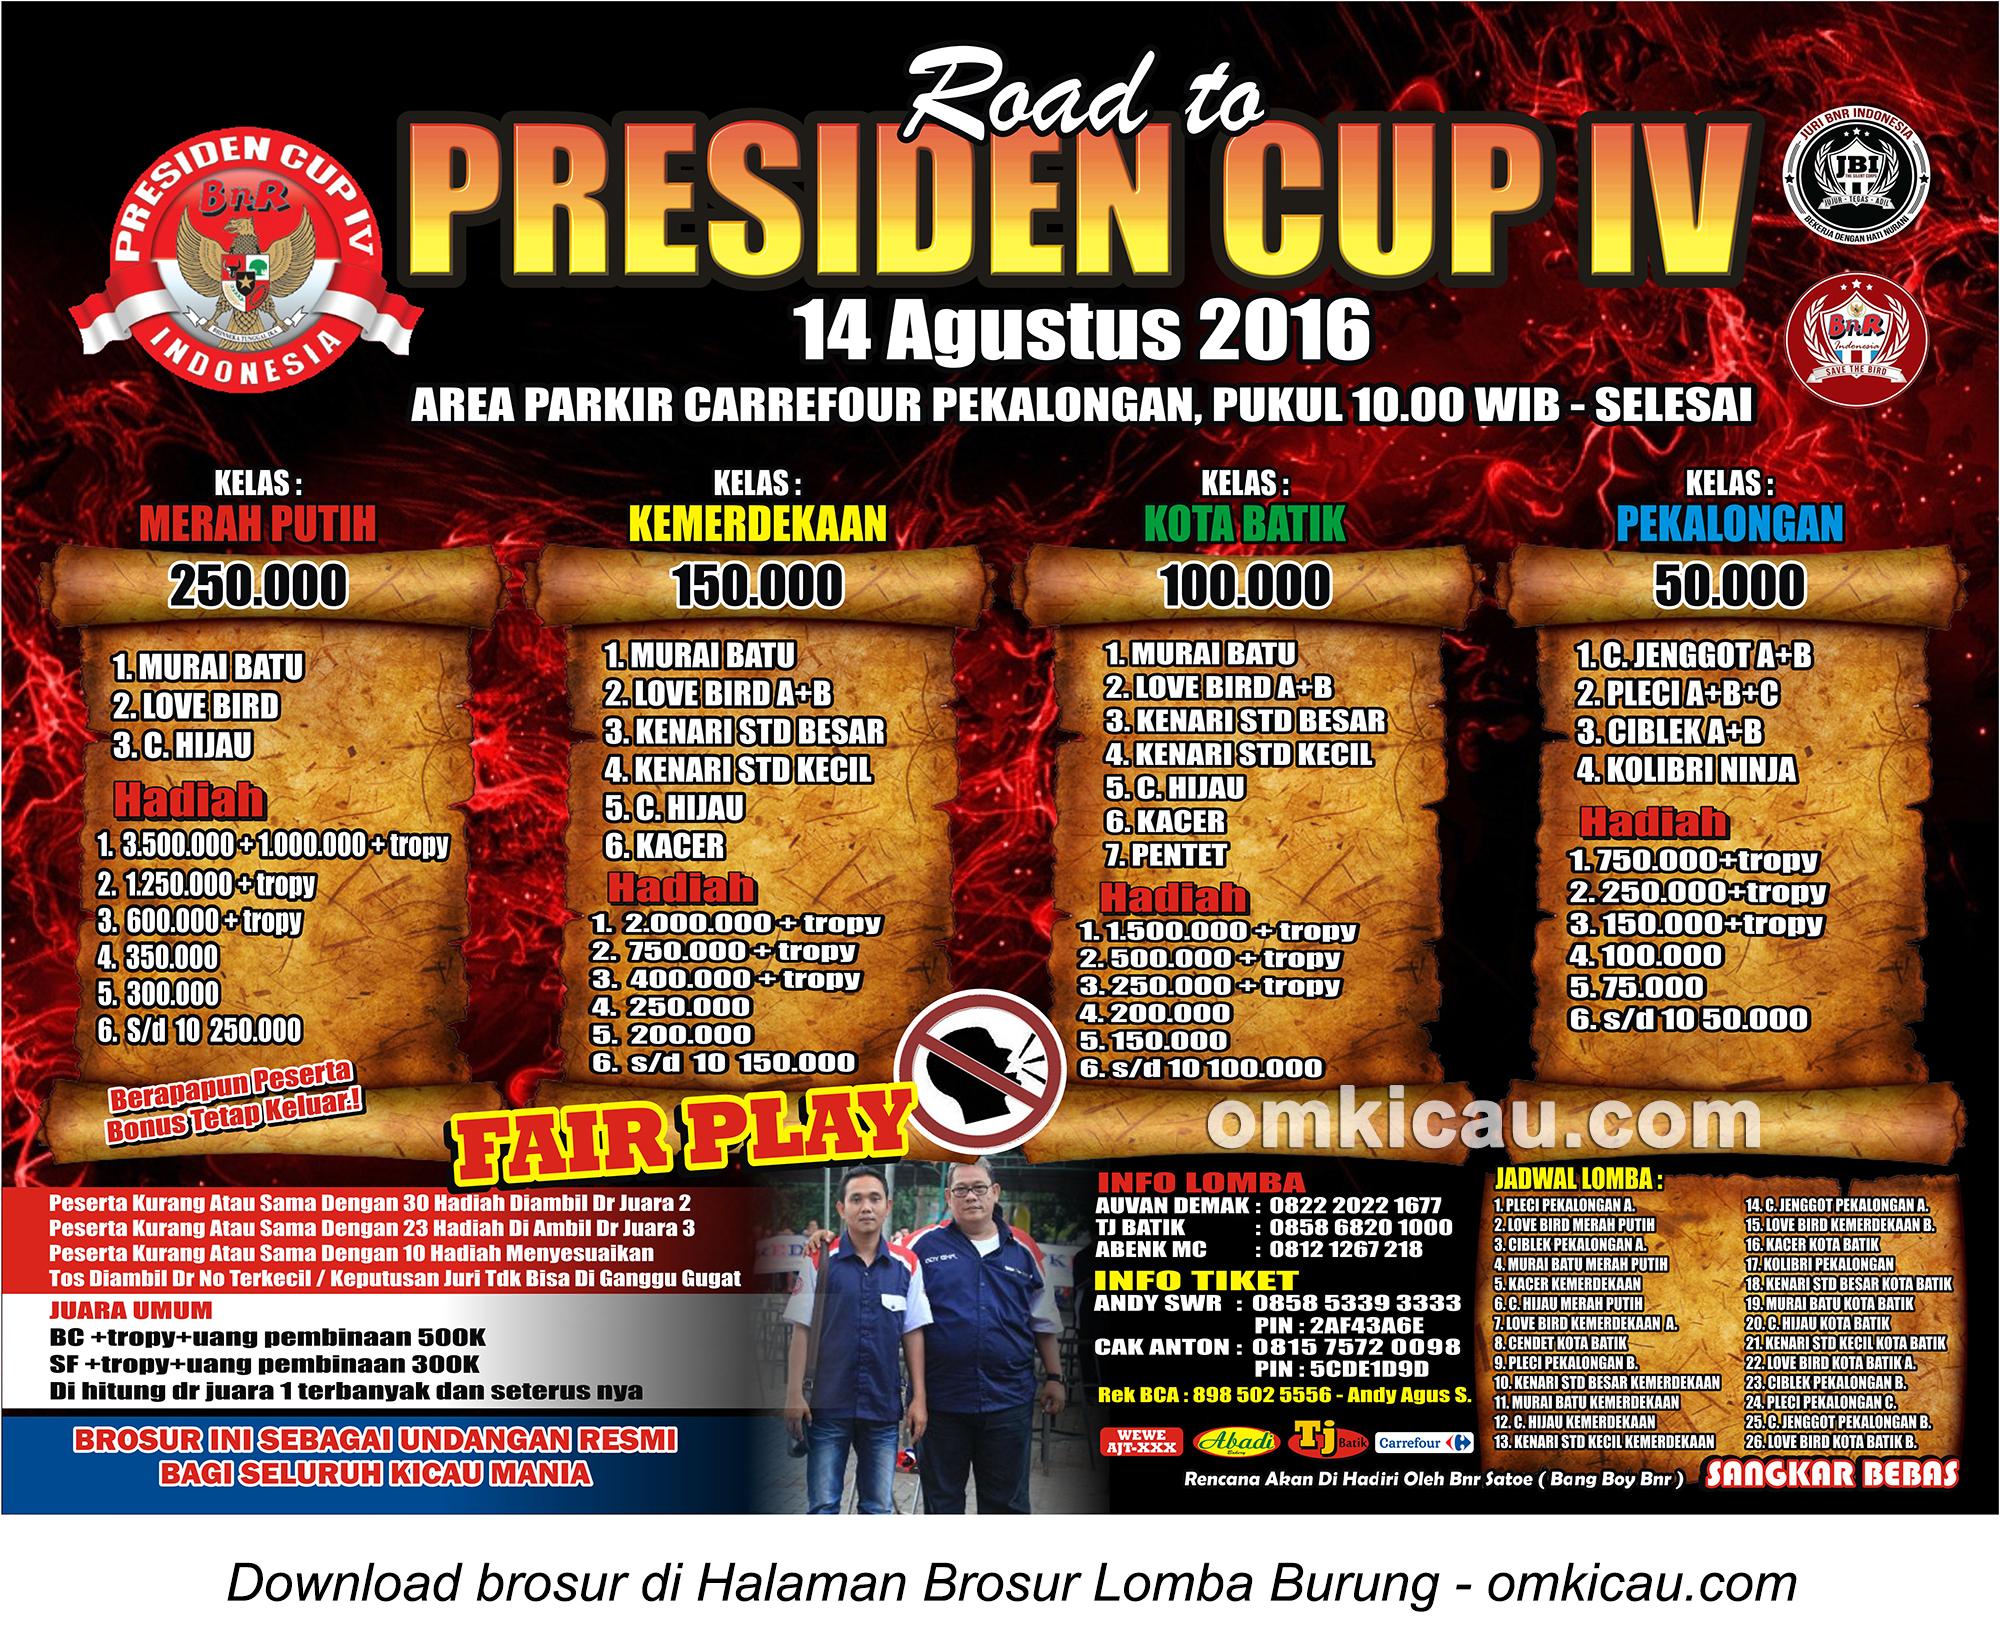 Brosur Revisi Lomba Burung Berkicau Road to Presiden Cup IV, Pekalongan, 14 Agustus 2016